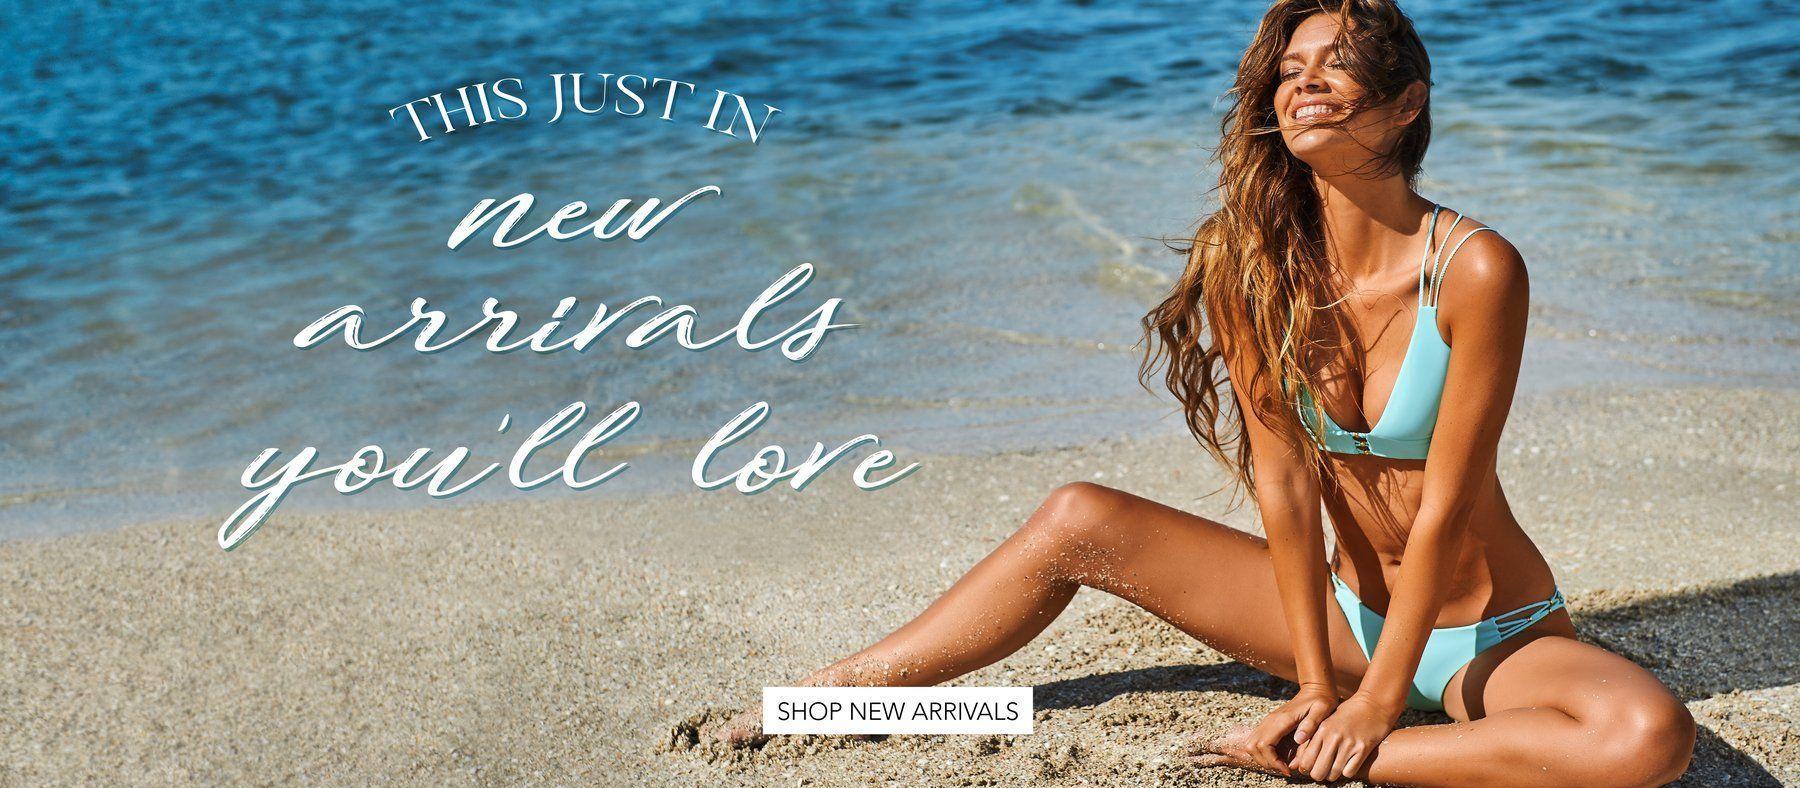 Bikini retailers host online customer galleries